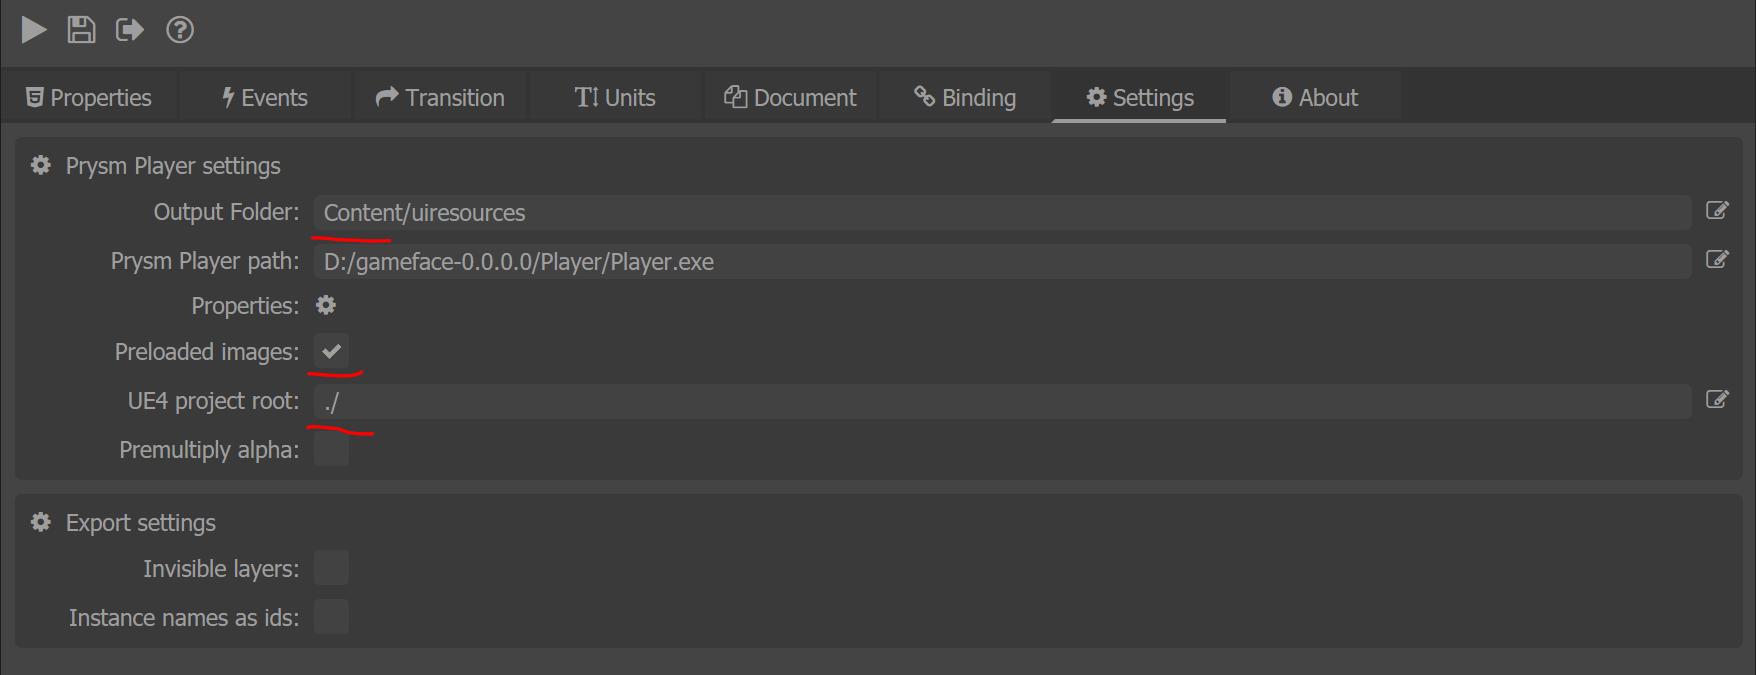 Live UE4 Editing - Coherent Prysm Documentation